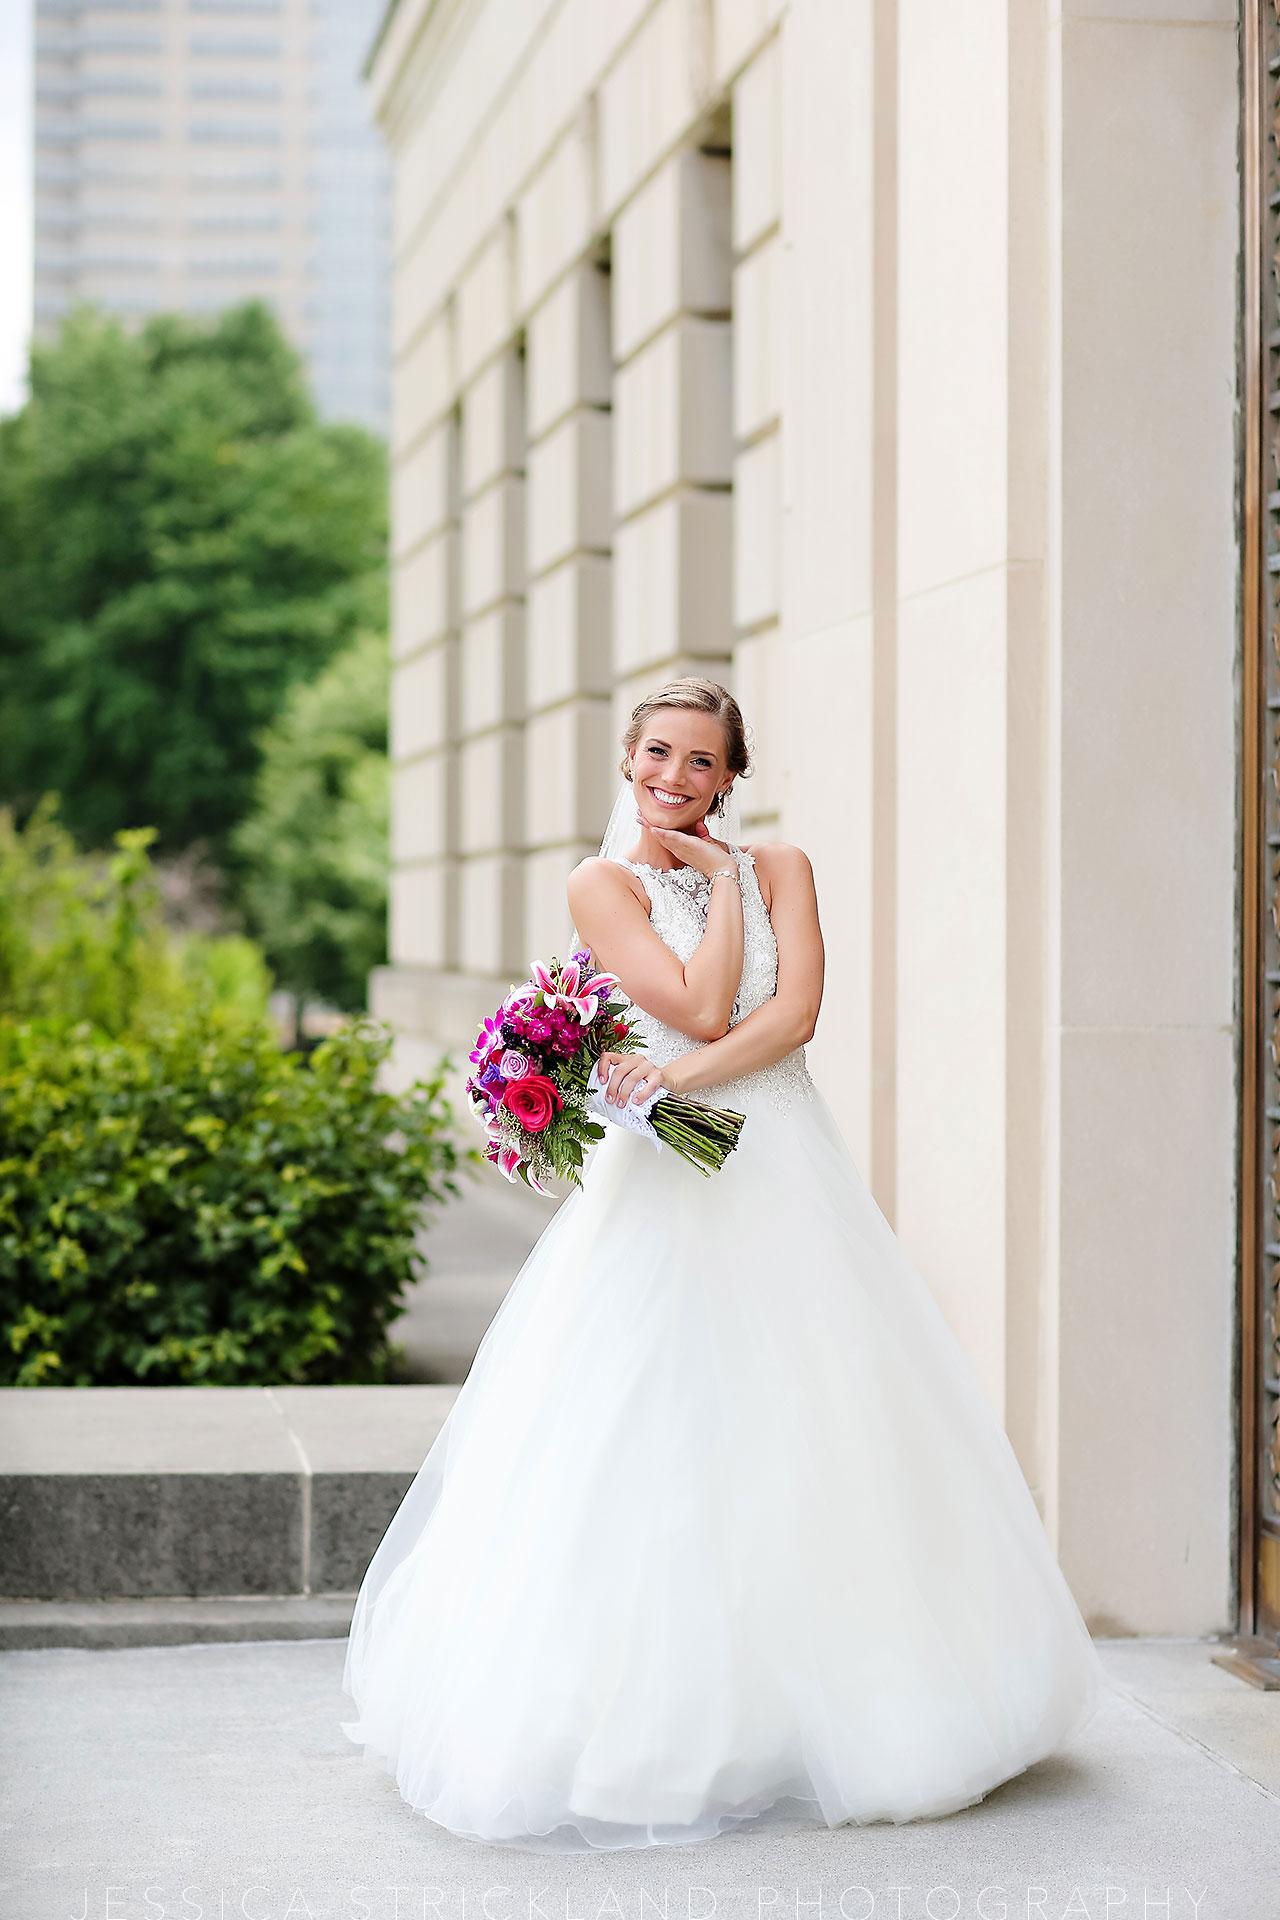 Serra Alex Regions Tower Indianapolis Wedding 124 watermarked